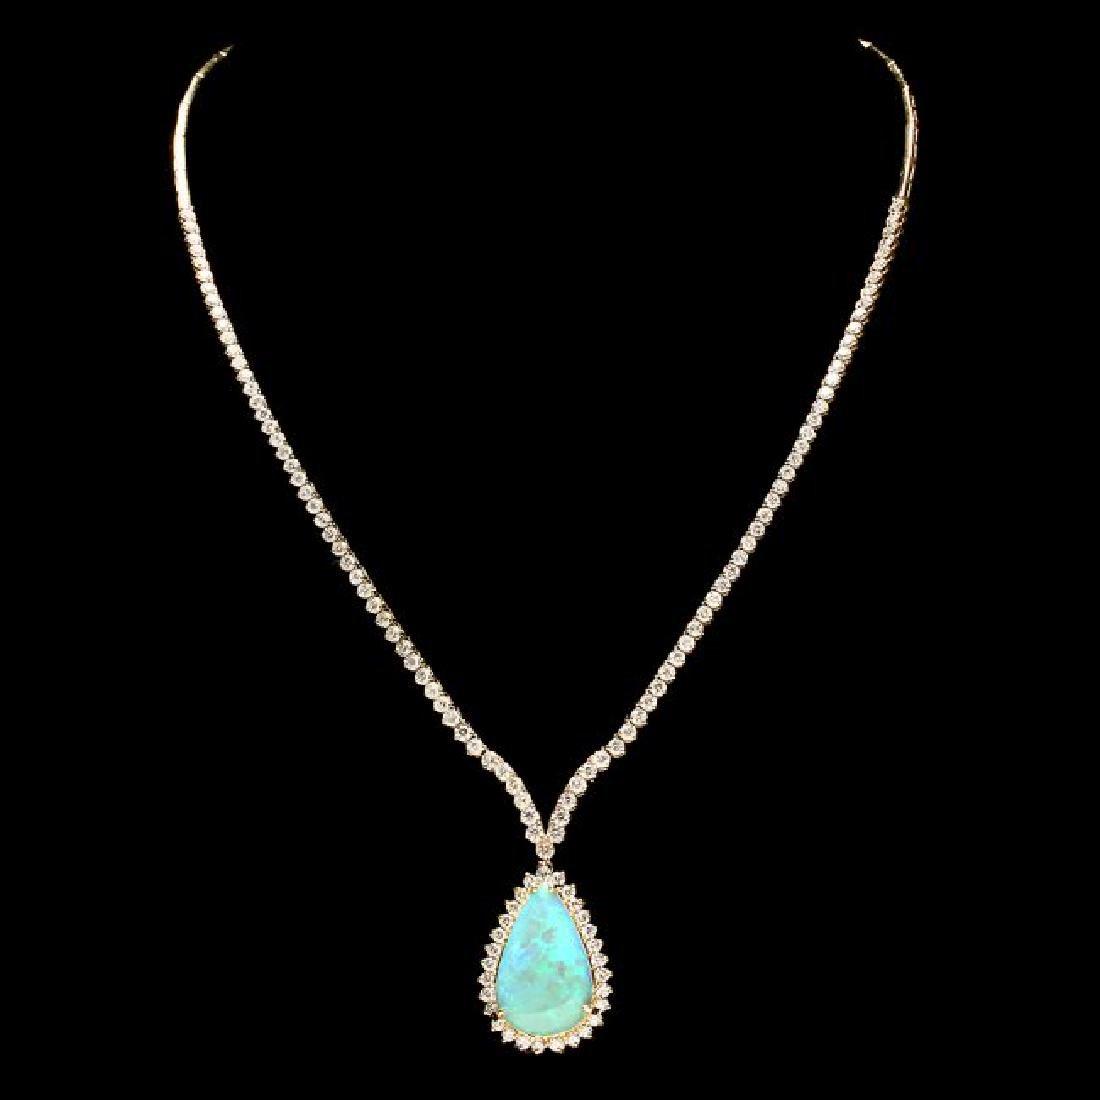 14k Gold 9.00ct Opal 6.50ct Diamond Pendant - 2